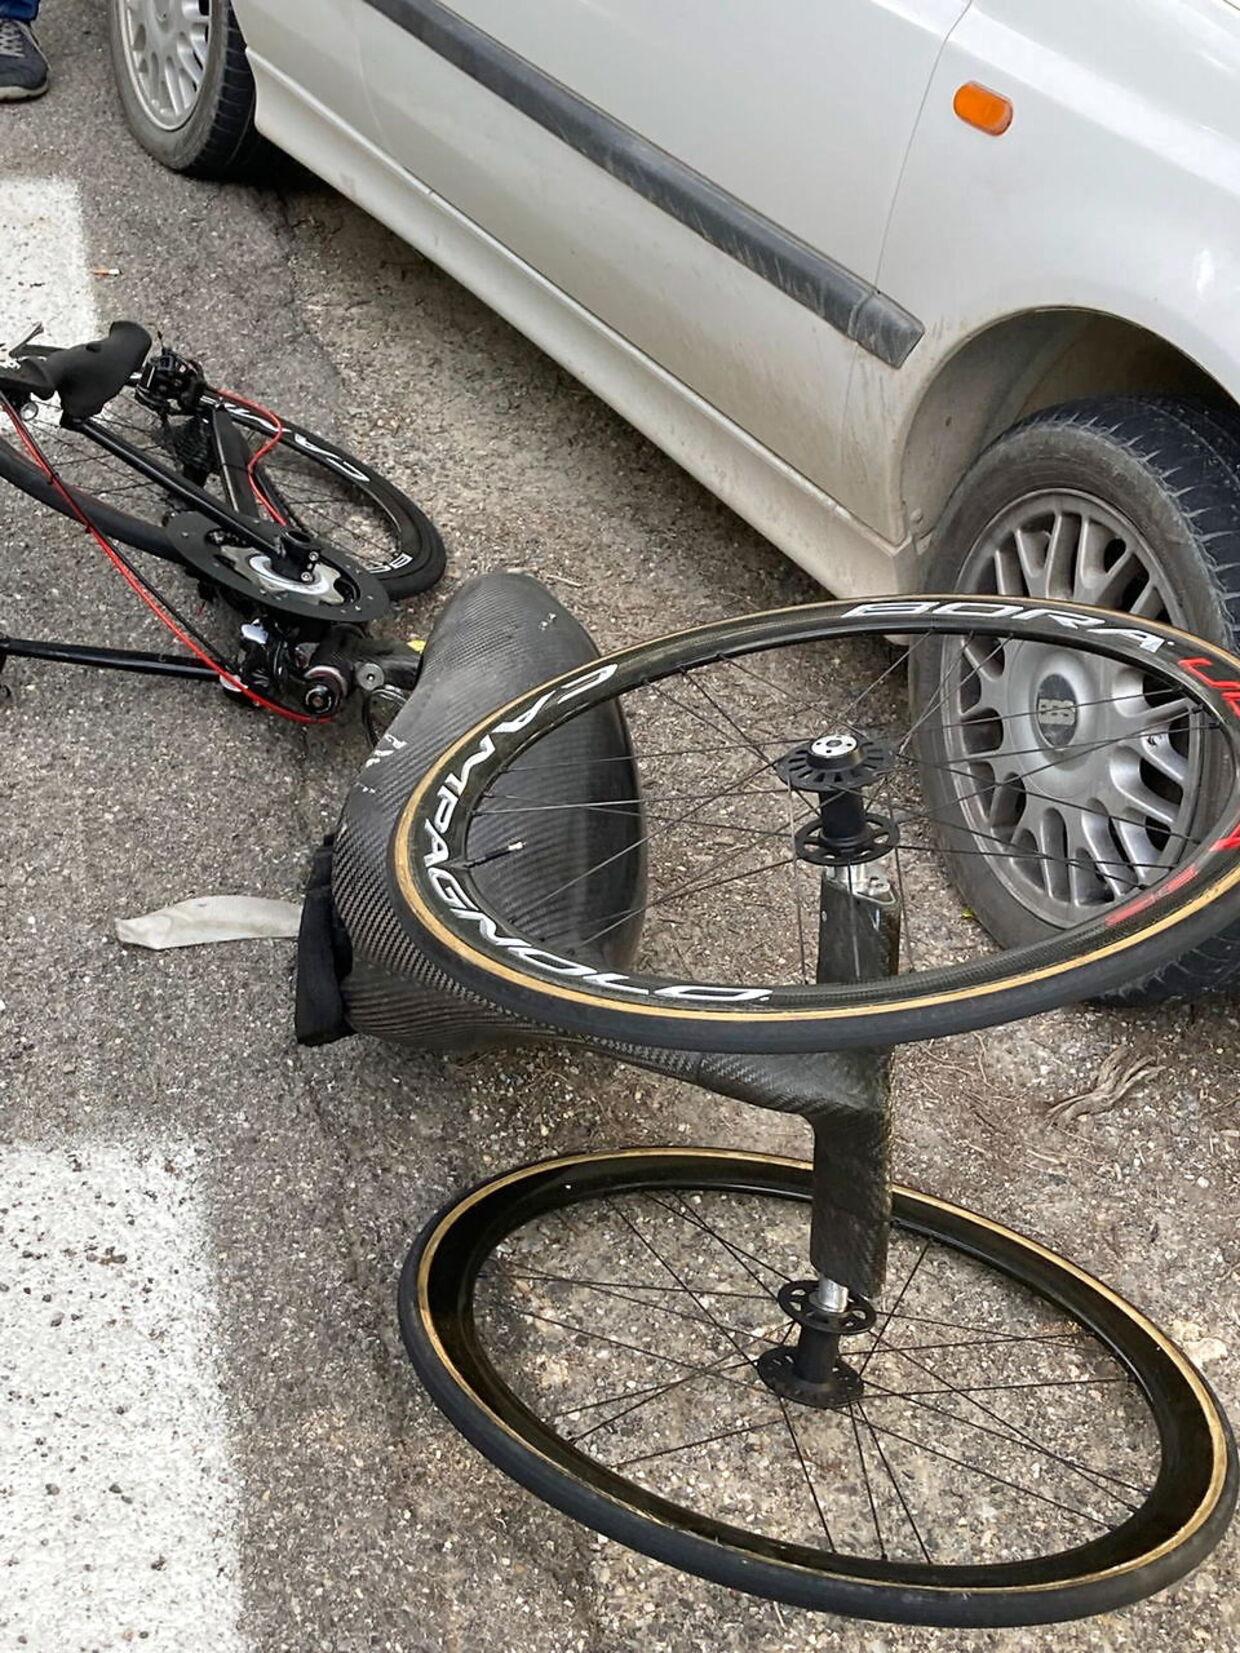 Alex Zanardis håndcykel efter ulykken.